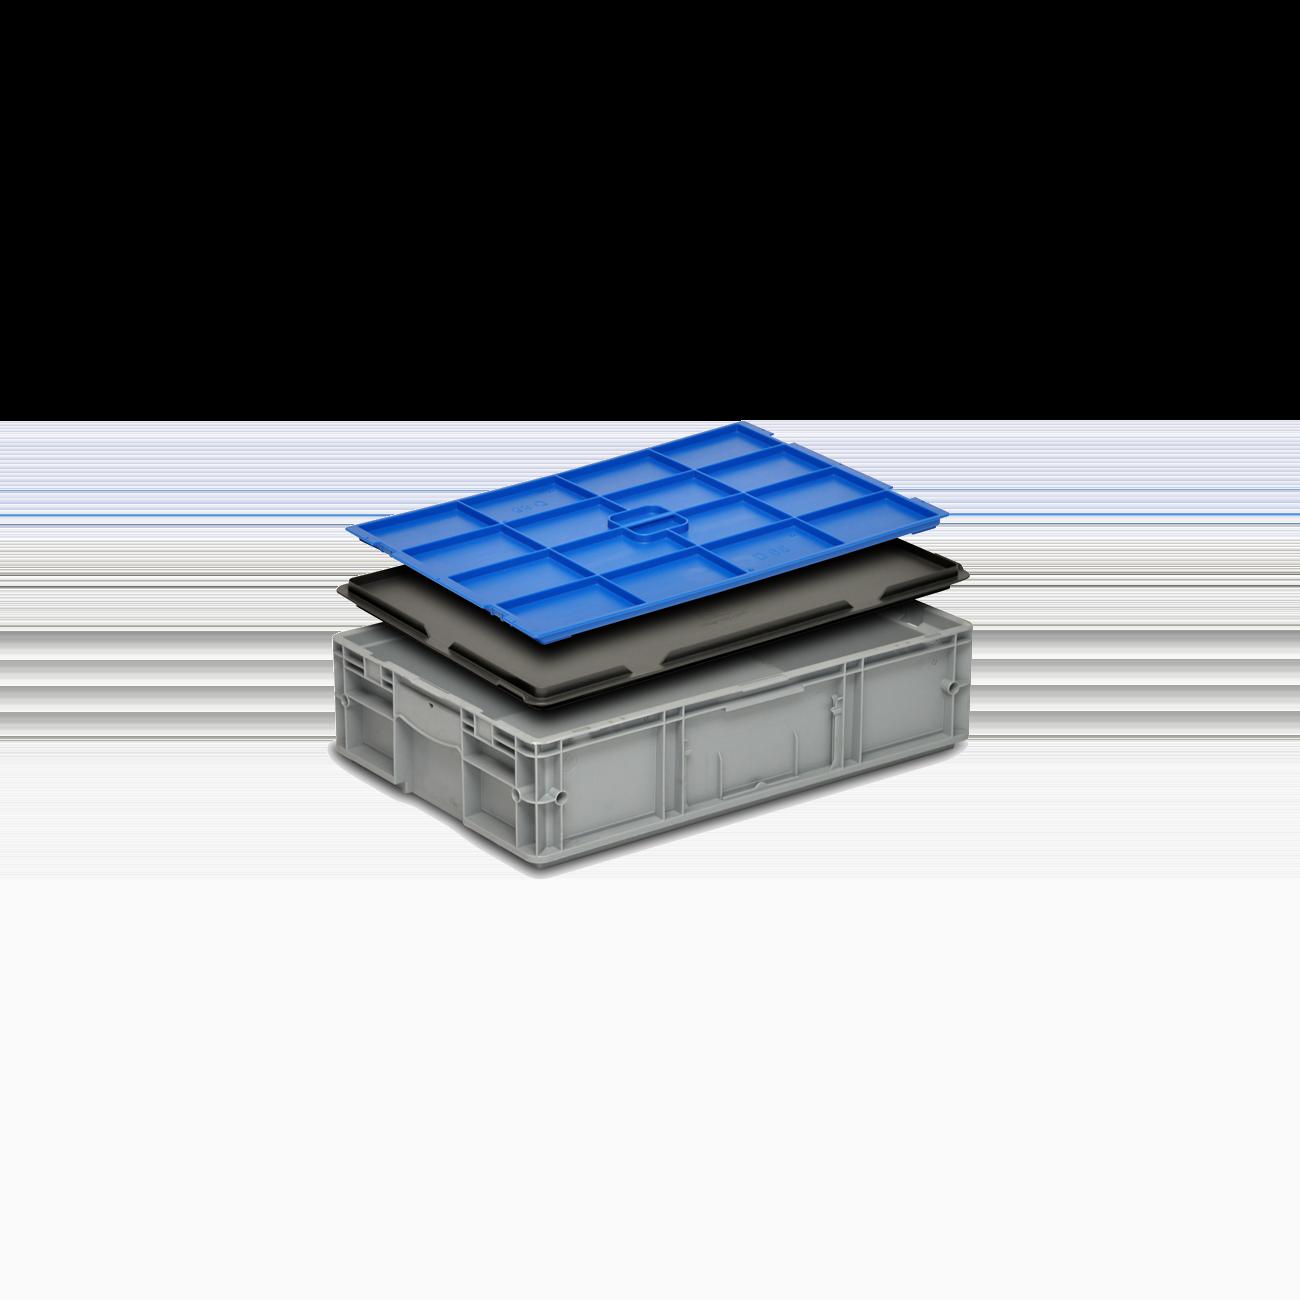 Solid Plastic Container VDA-RL-KLT 6147